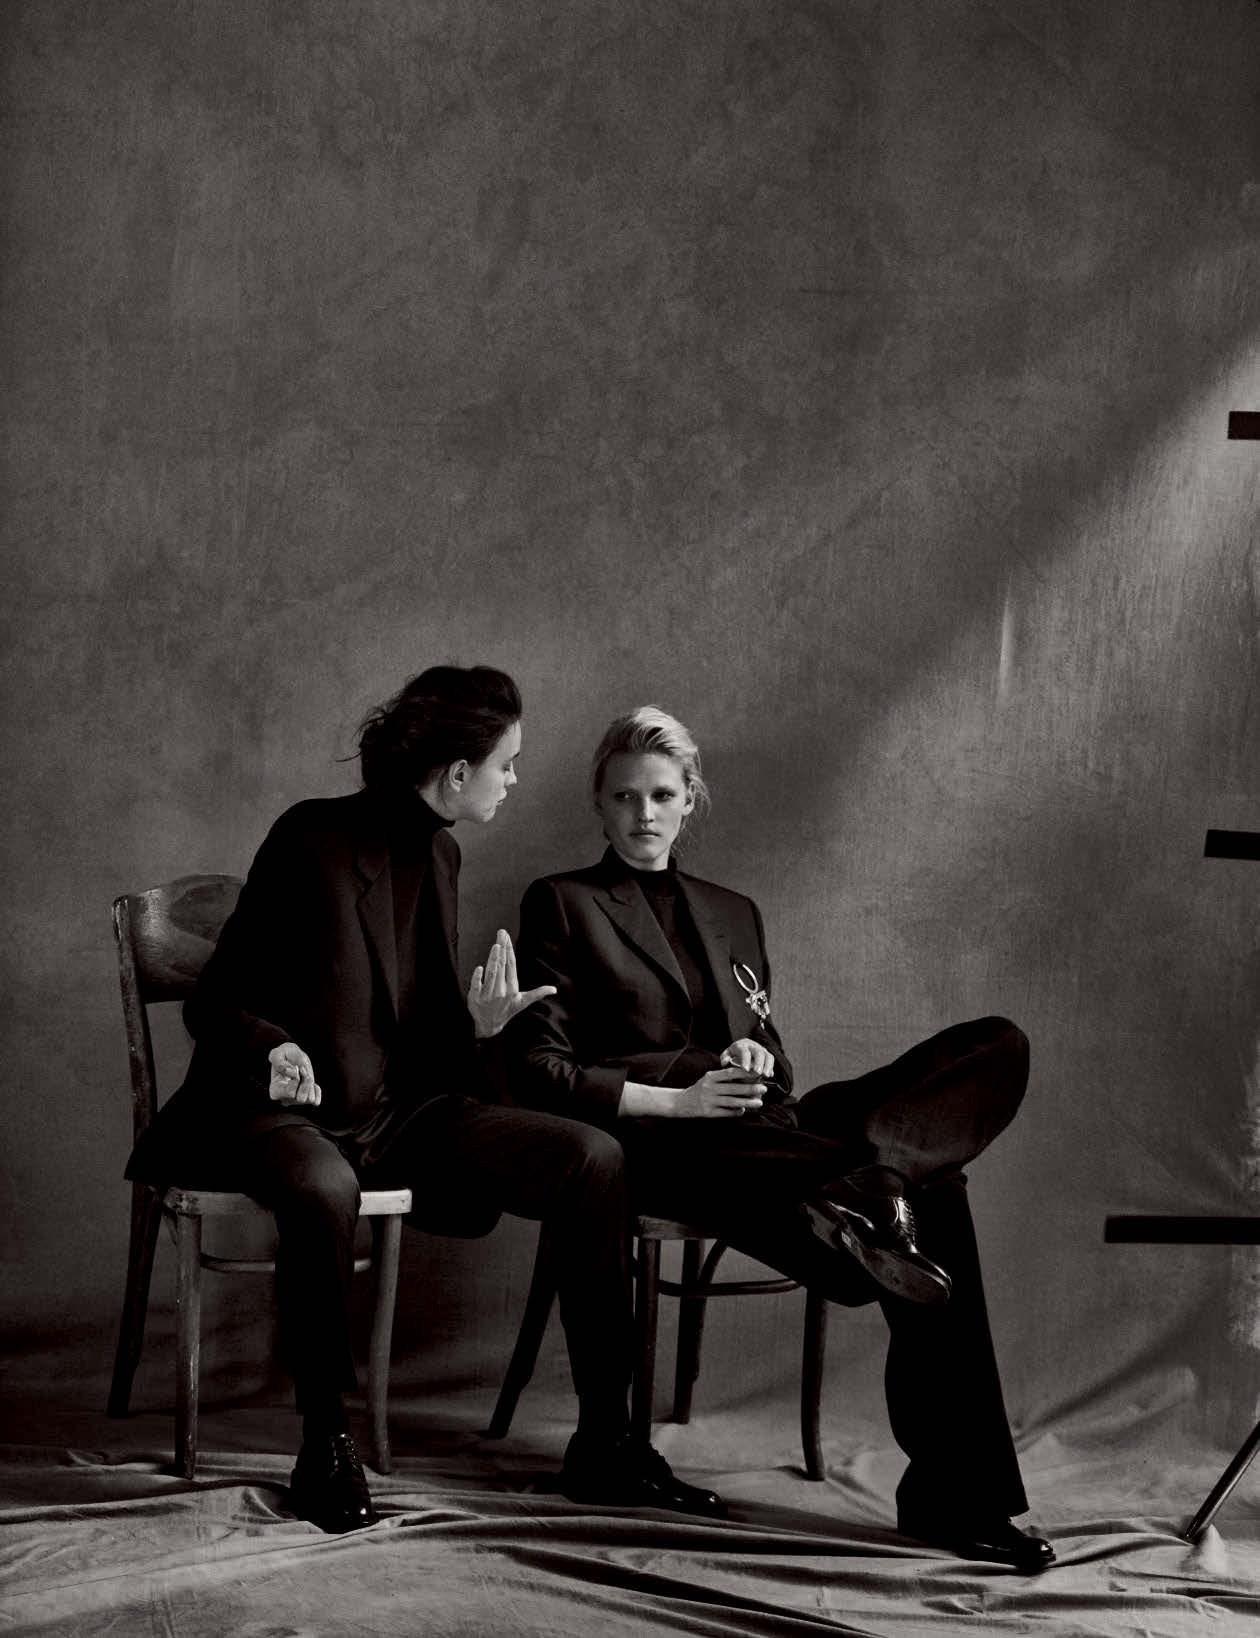 Vogue-Germany-May-2017-by-Peter-Lindbergh-44-Irina-Shayk-Lara-Stone